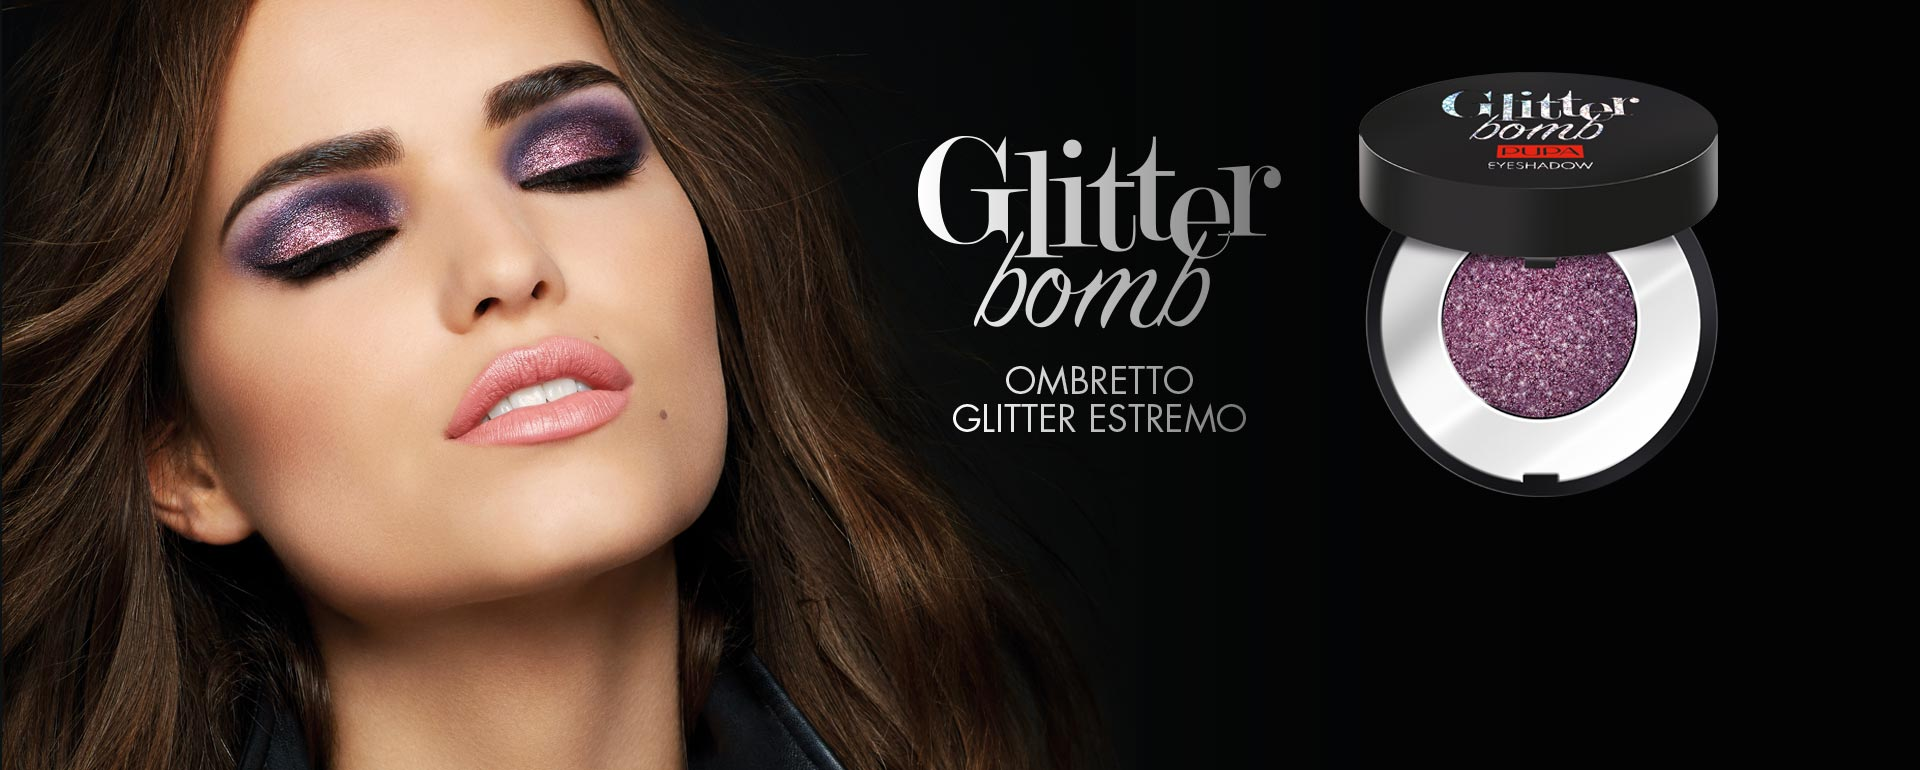 Glitter Bomb Eyeshadow - PUPA Milano